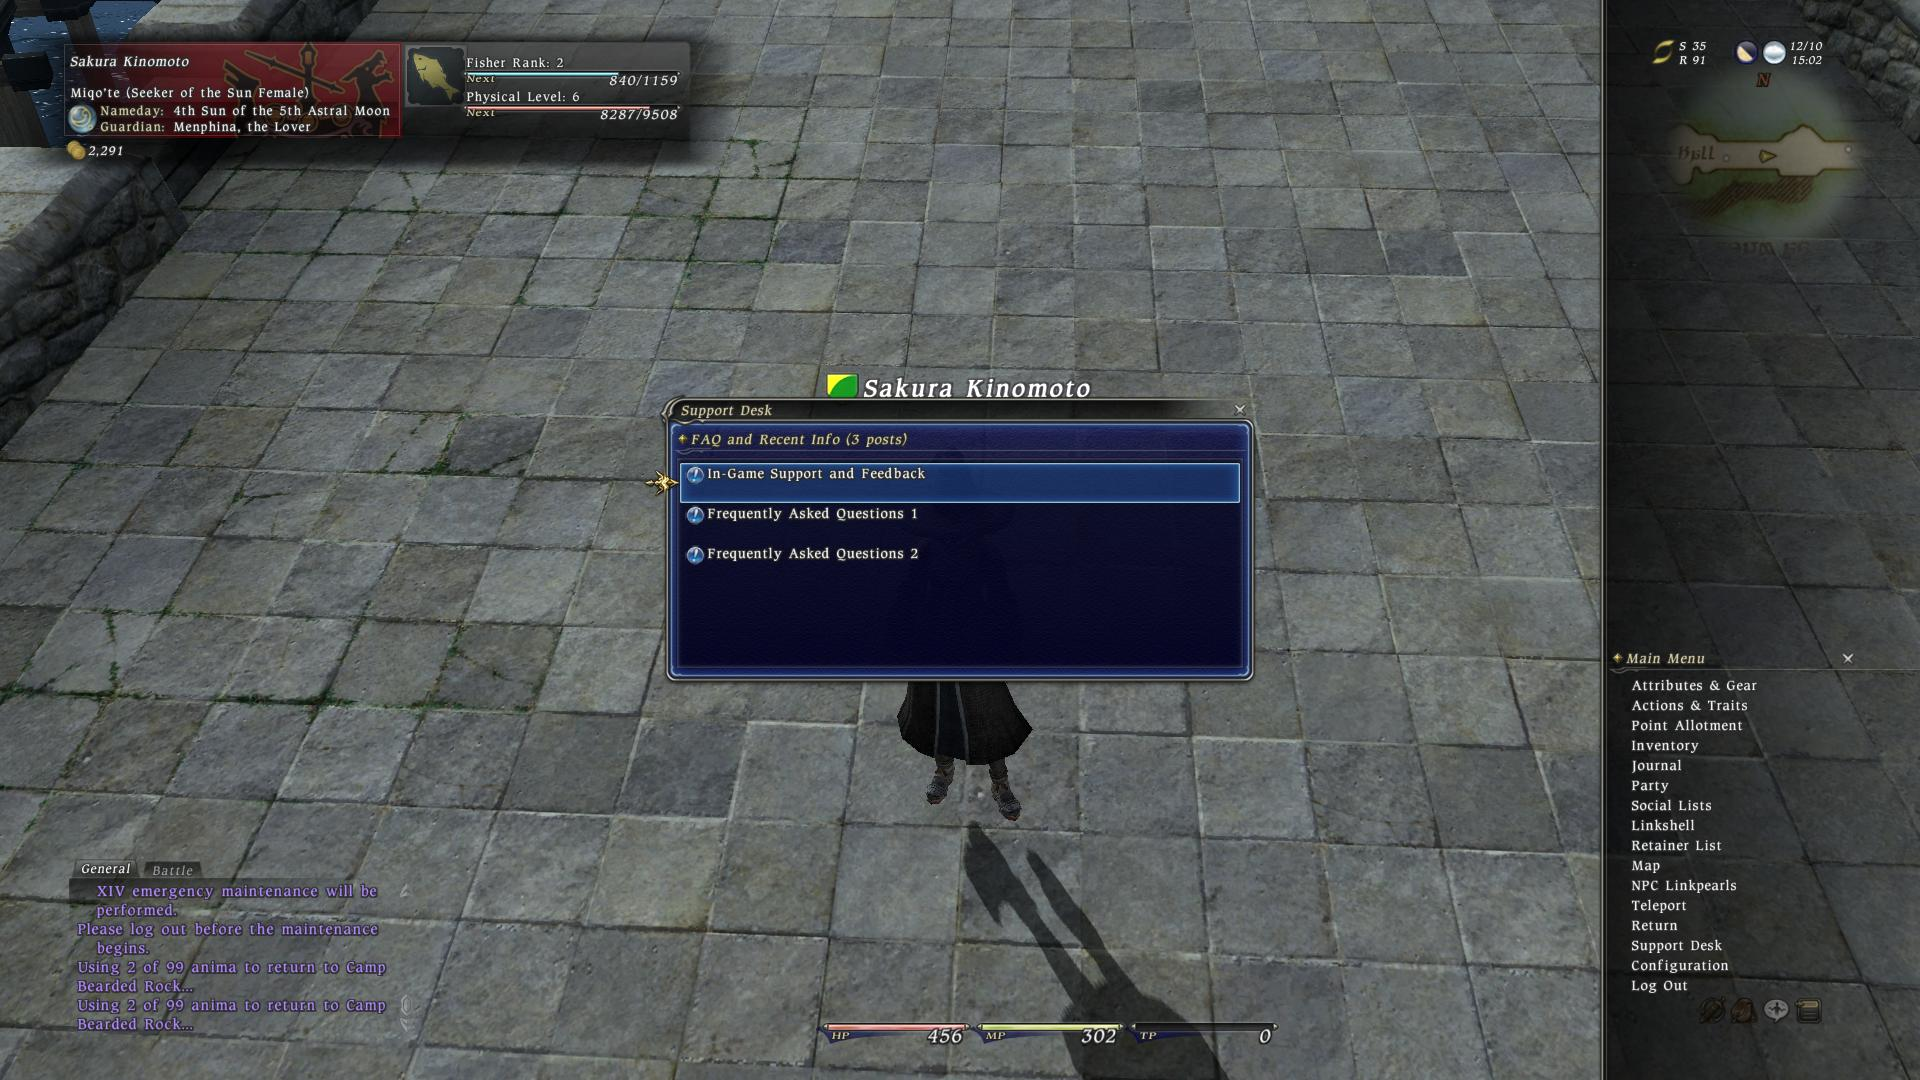 Final Fantasy XIV Daily Digest #2 - 19